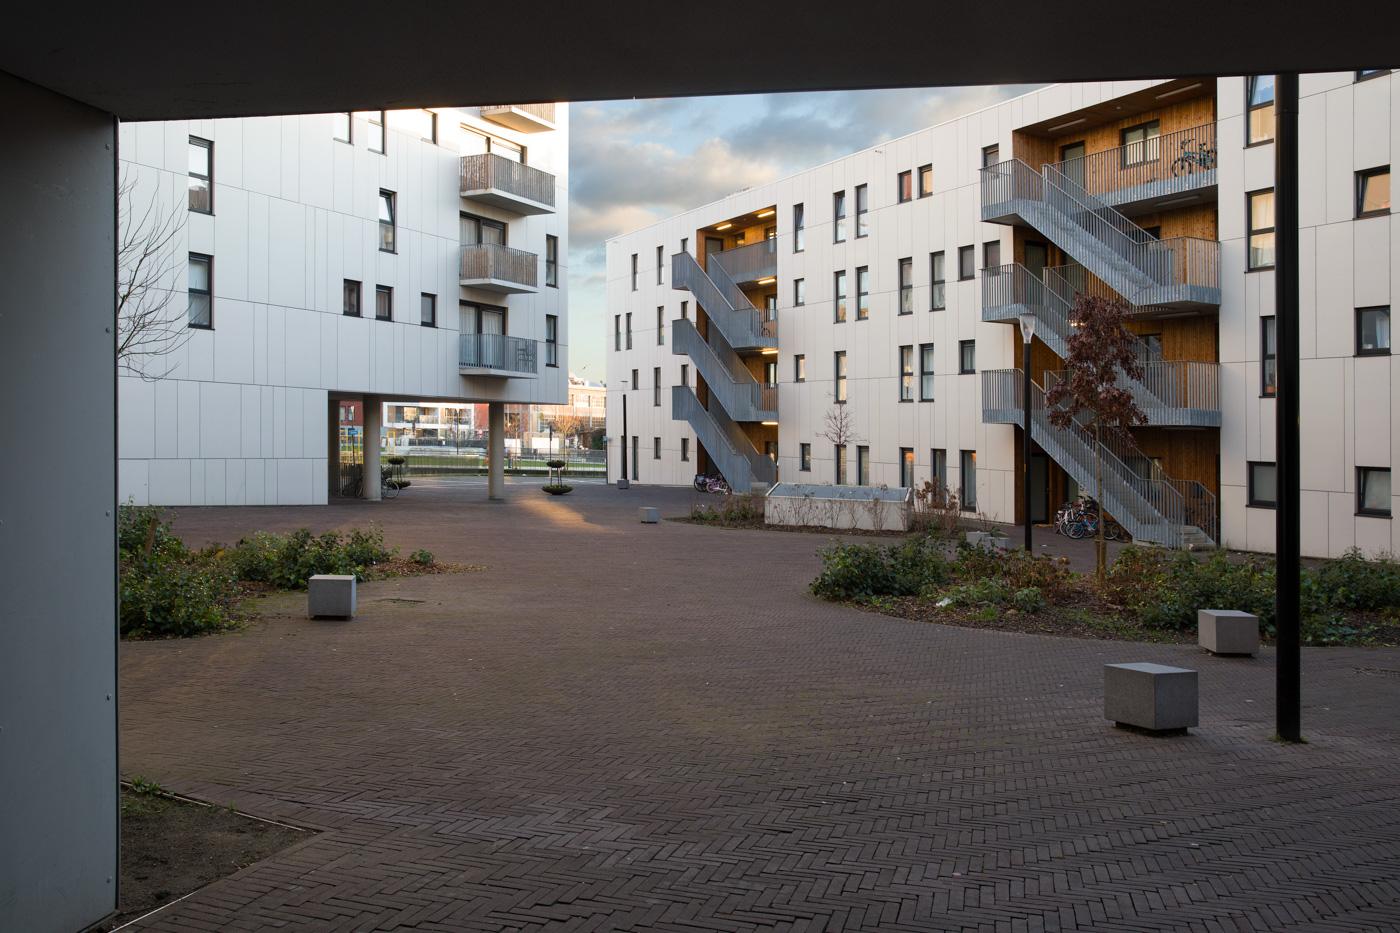 Vincent Defleur - Stedelijke ruimte